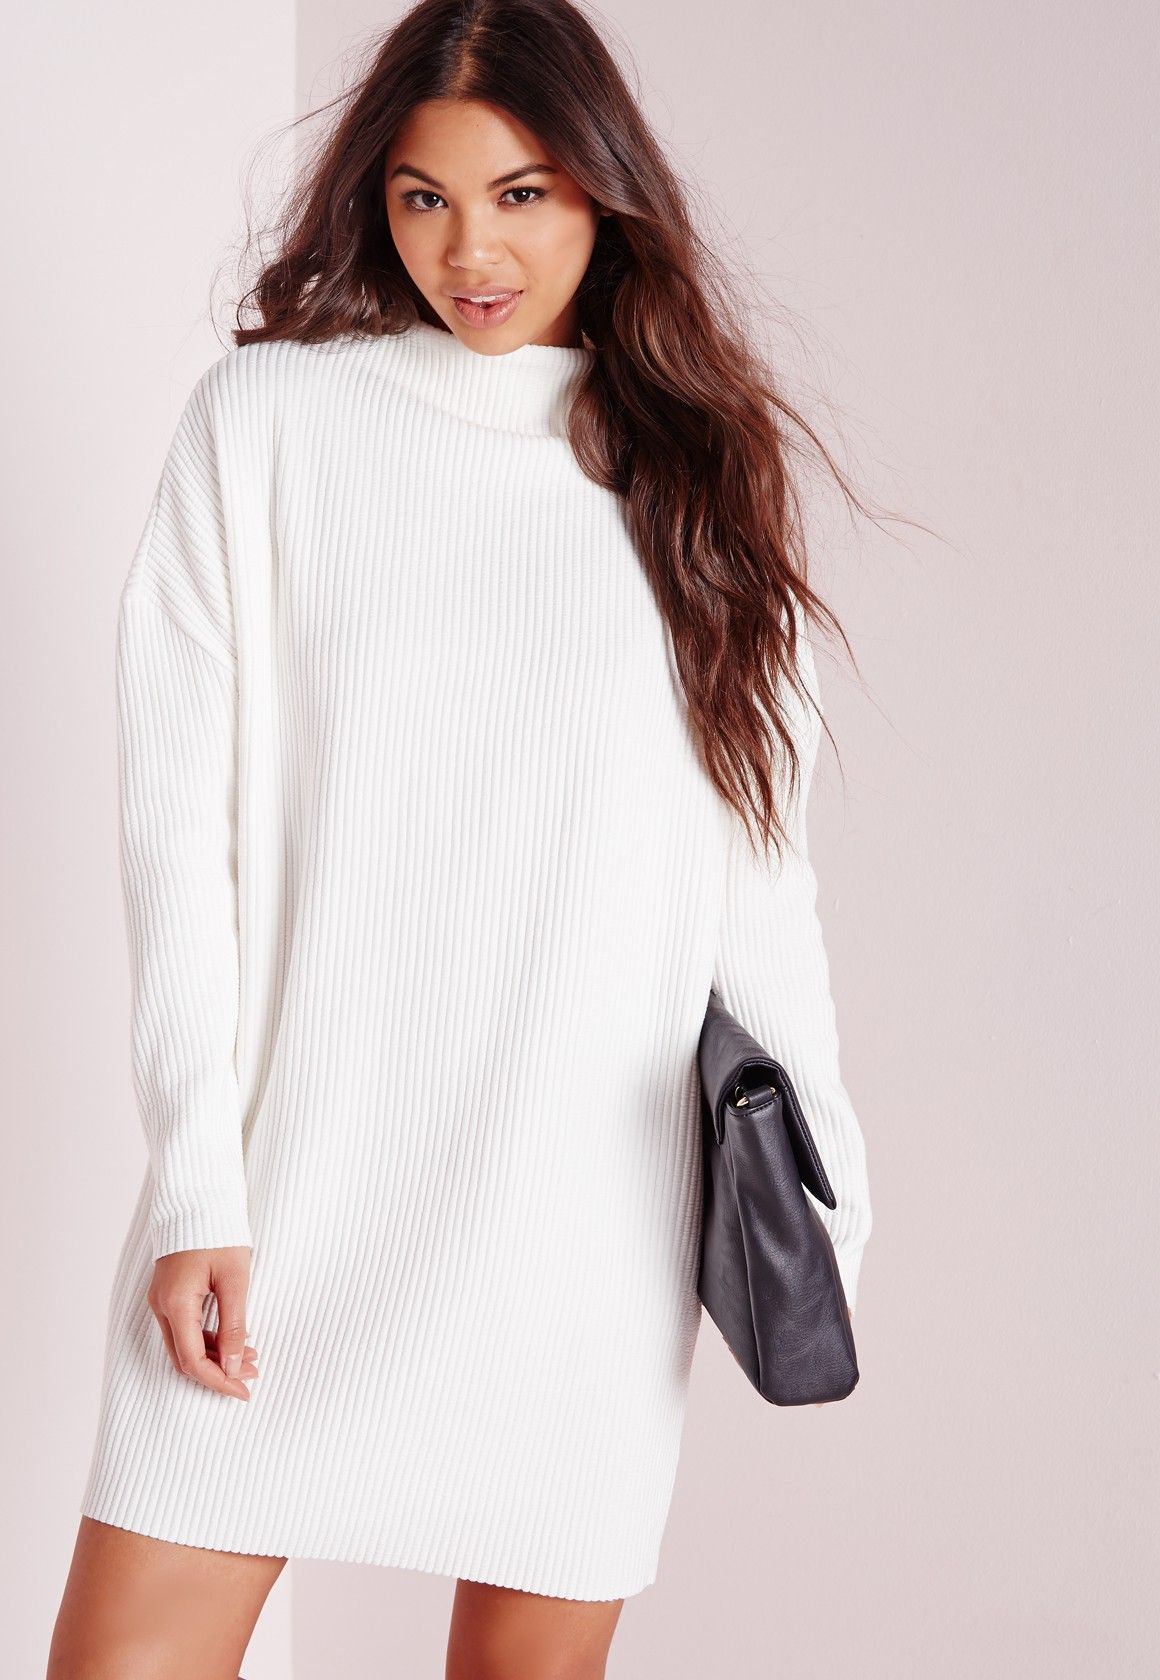 Missguided - Robe sweat blanche texturée à col montant